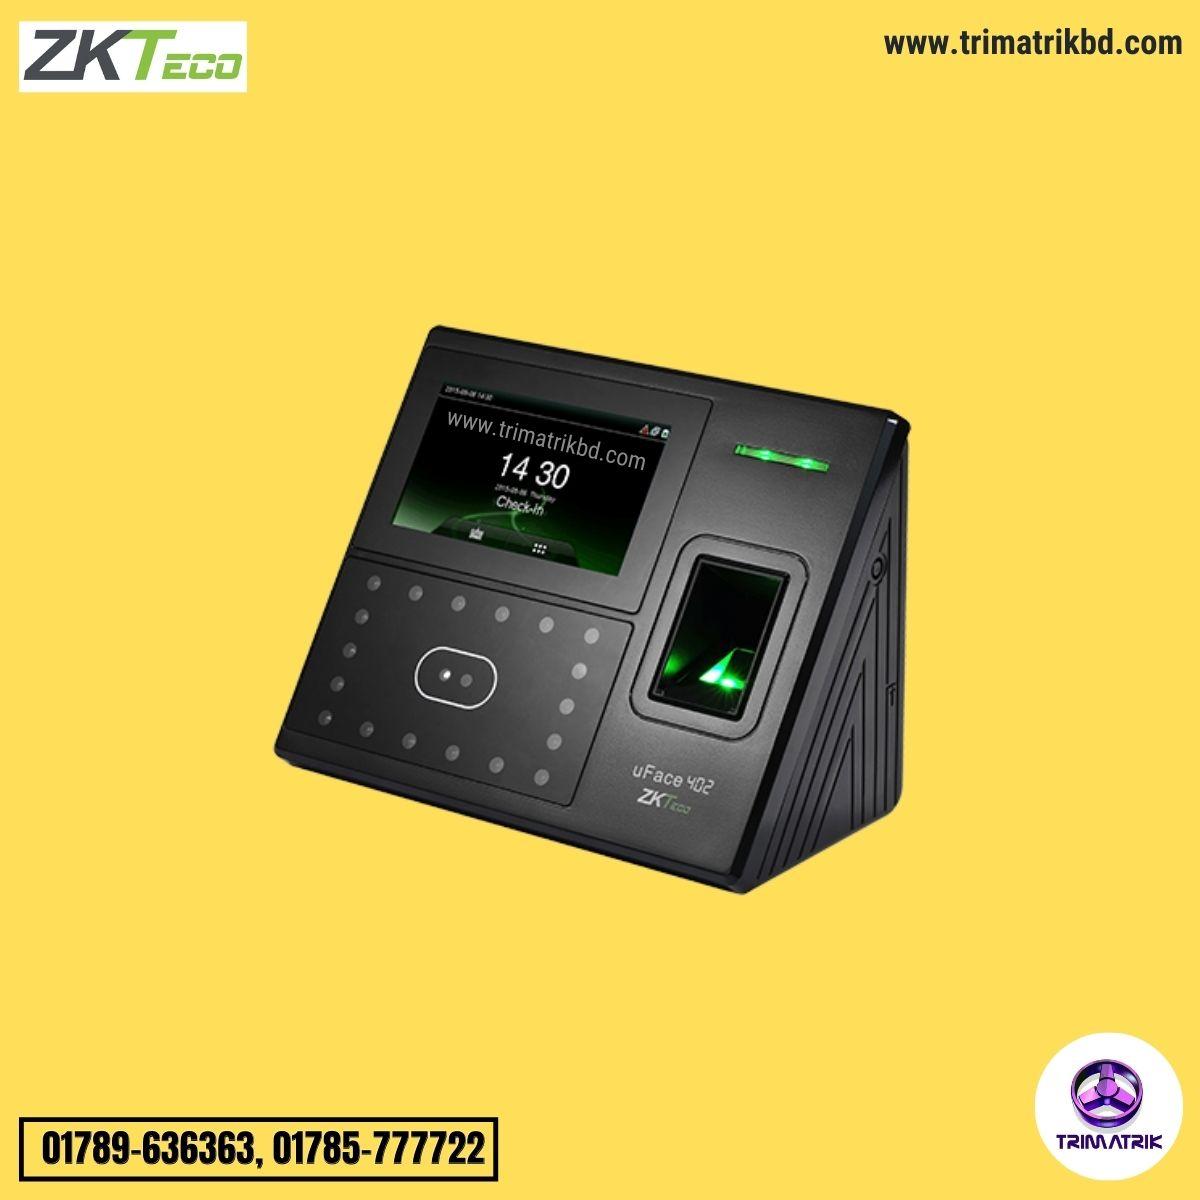 ZKTeco uFace402 Price in Bangladesh, TRIMATRIK